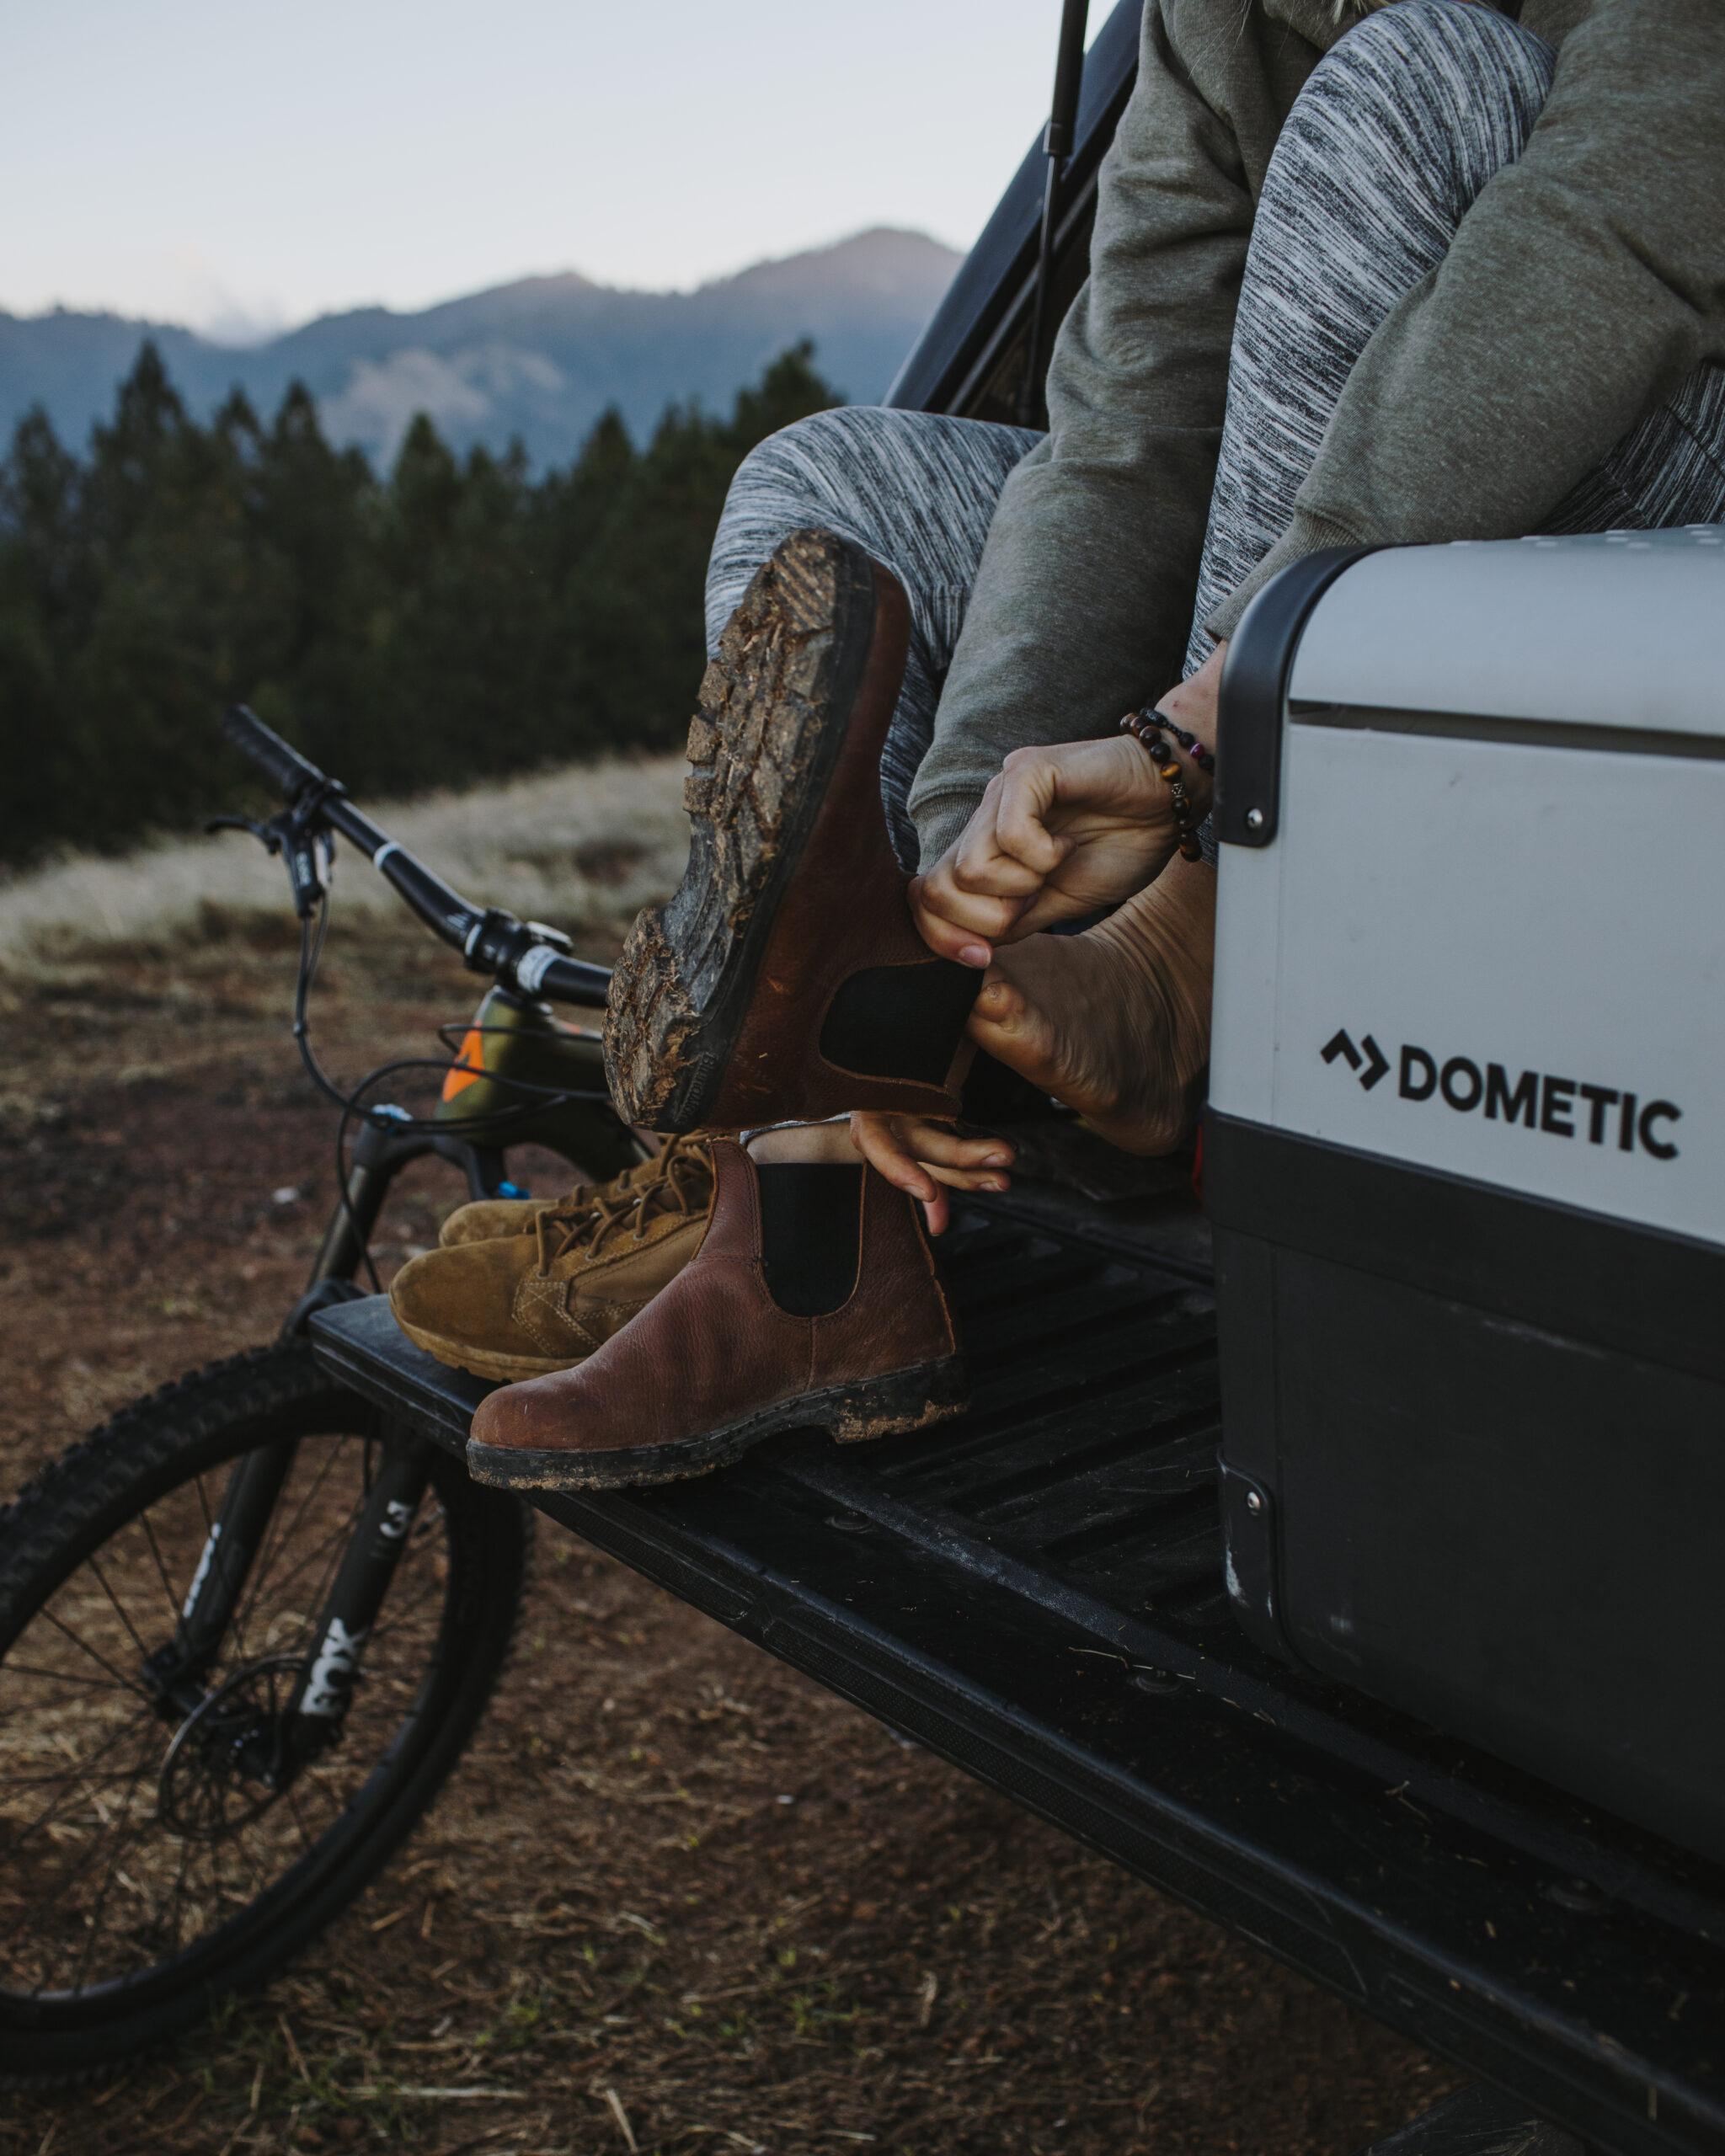 Diamondback Bikes - Dometic